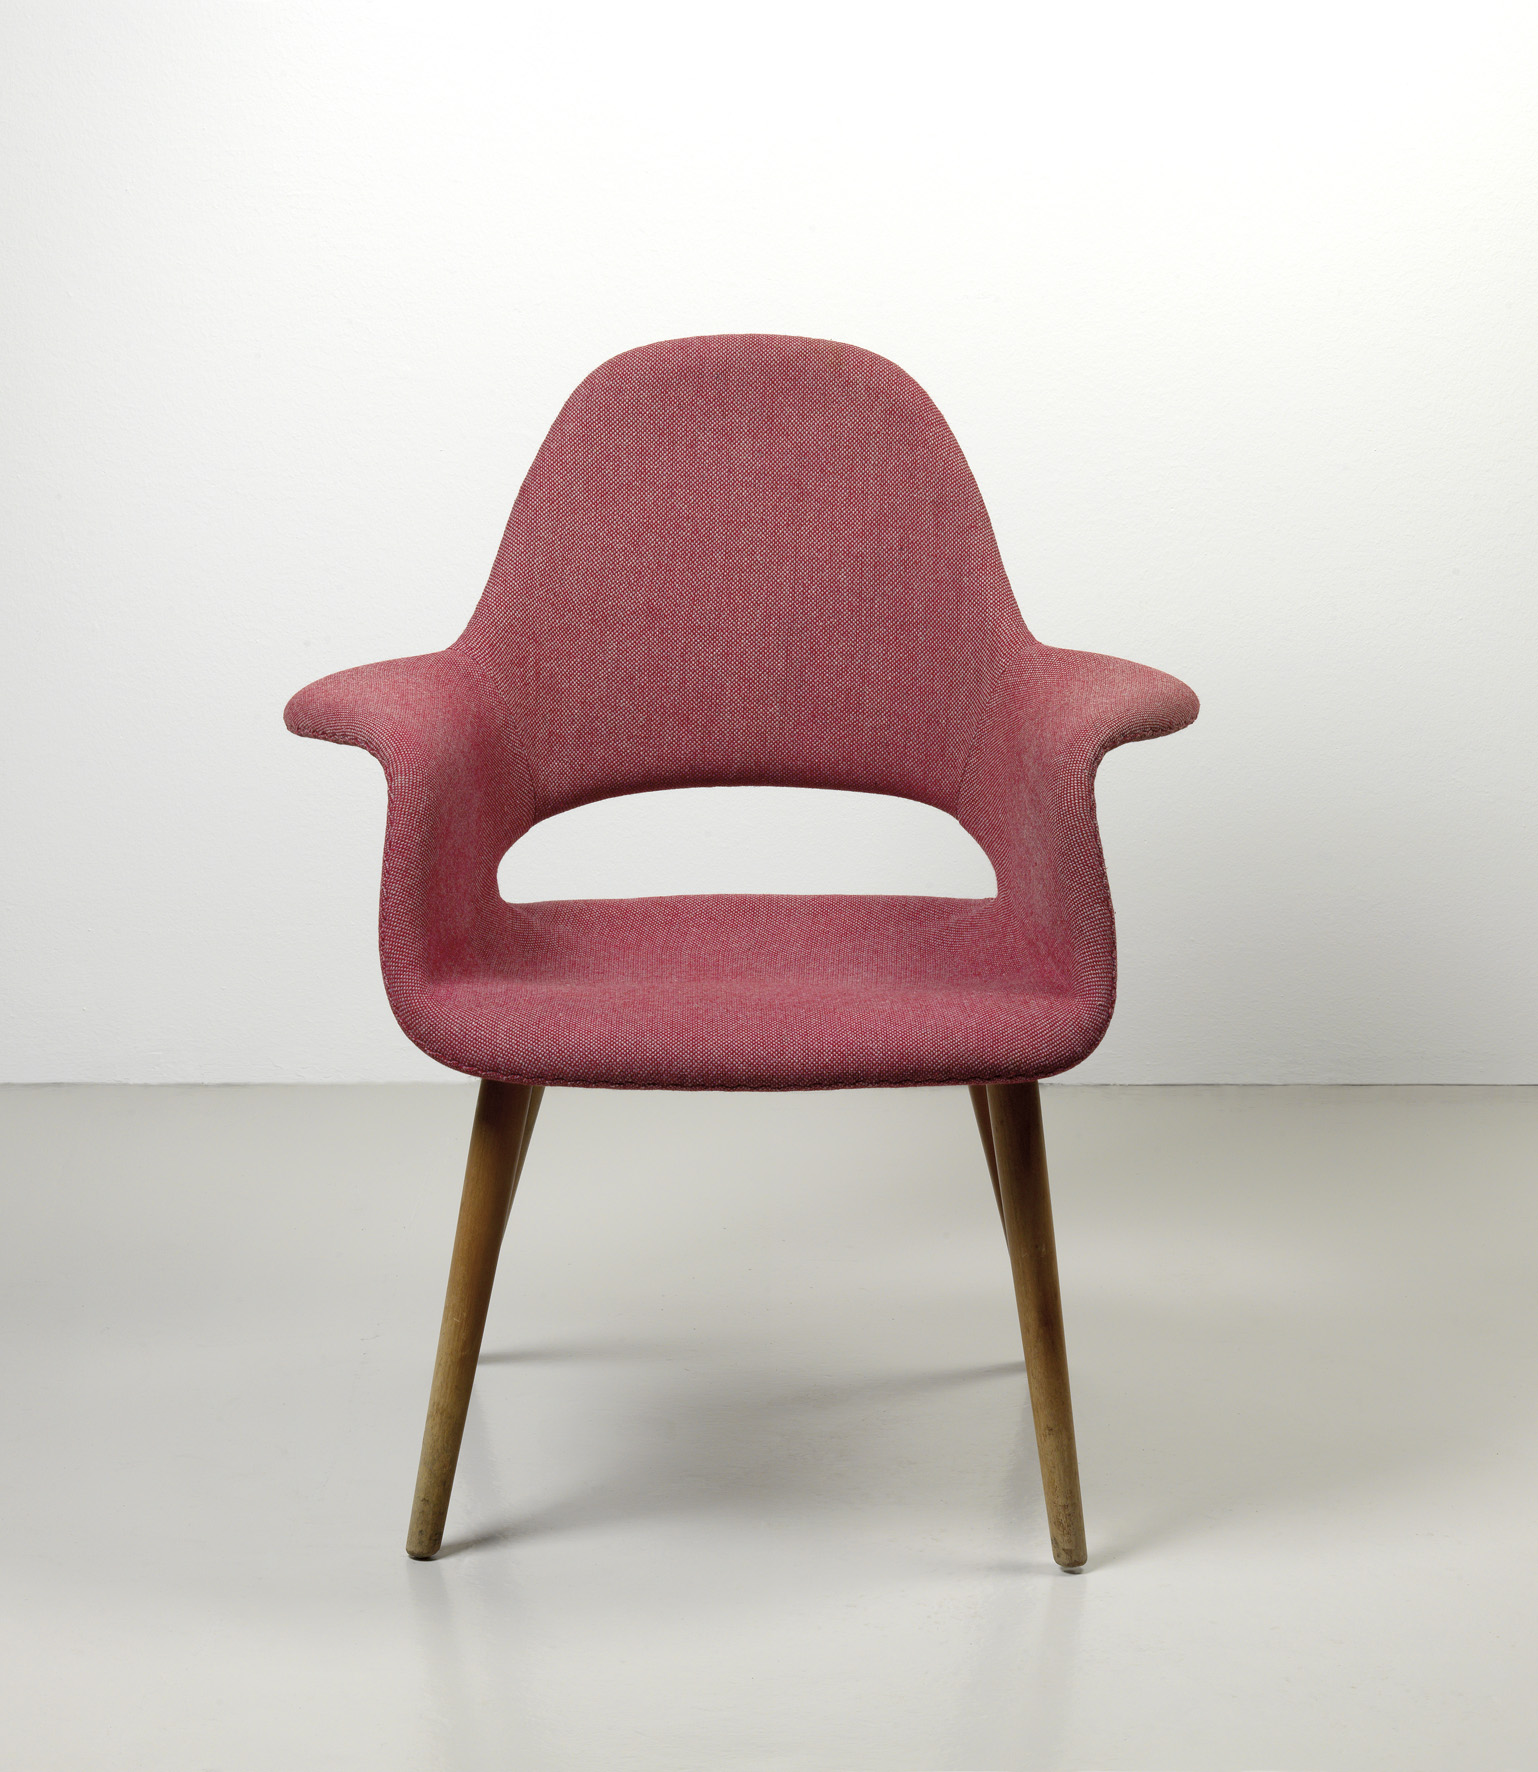 The Organic Chair